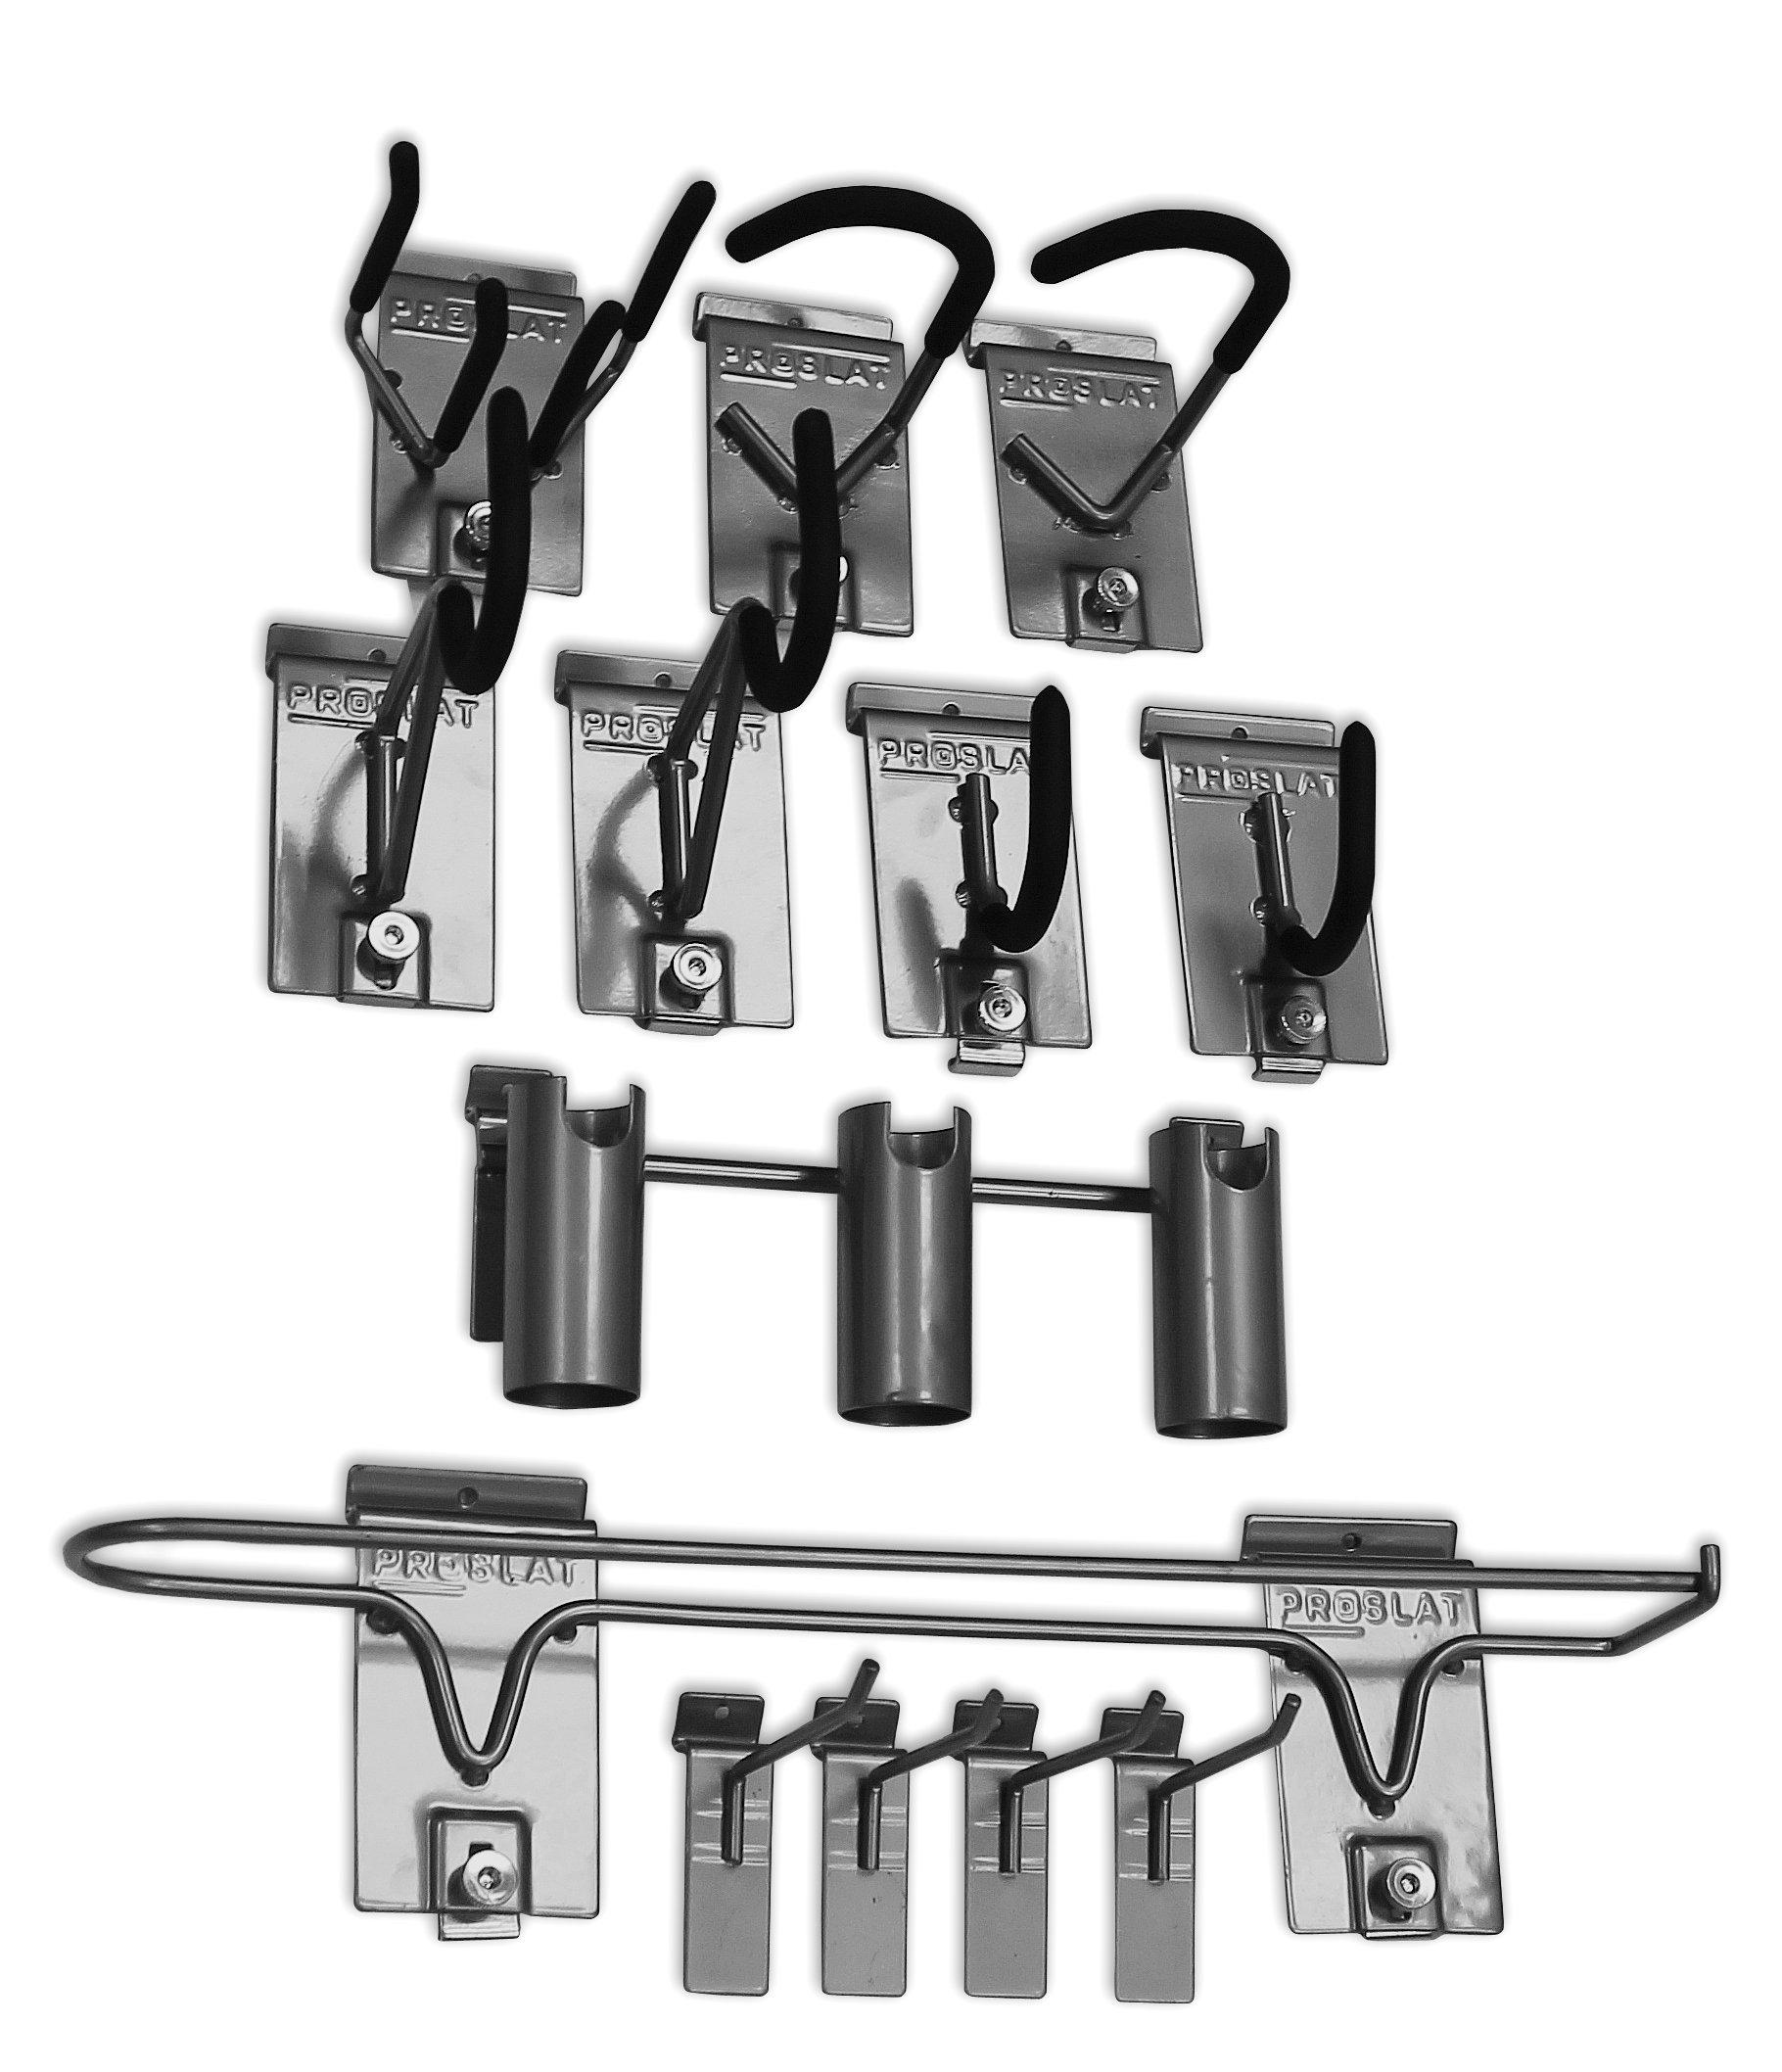 Proslat 11005 Sports Equipment Steel Hook Variety Kit Designed for Proslat PVC Slatwall, 13-Piece by Proslat (Image #1)